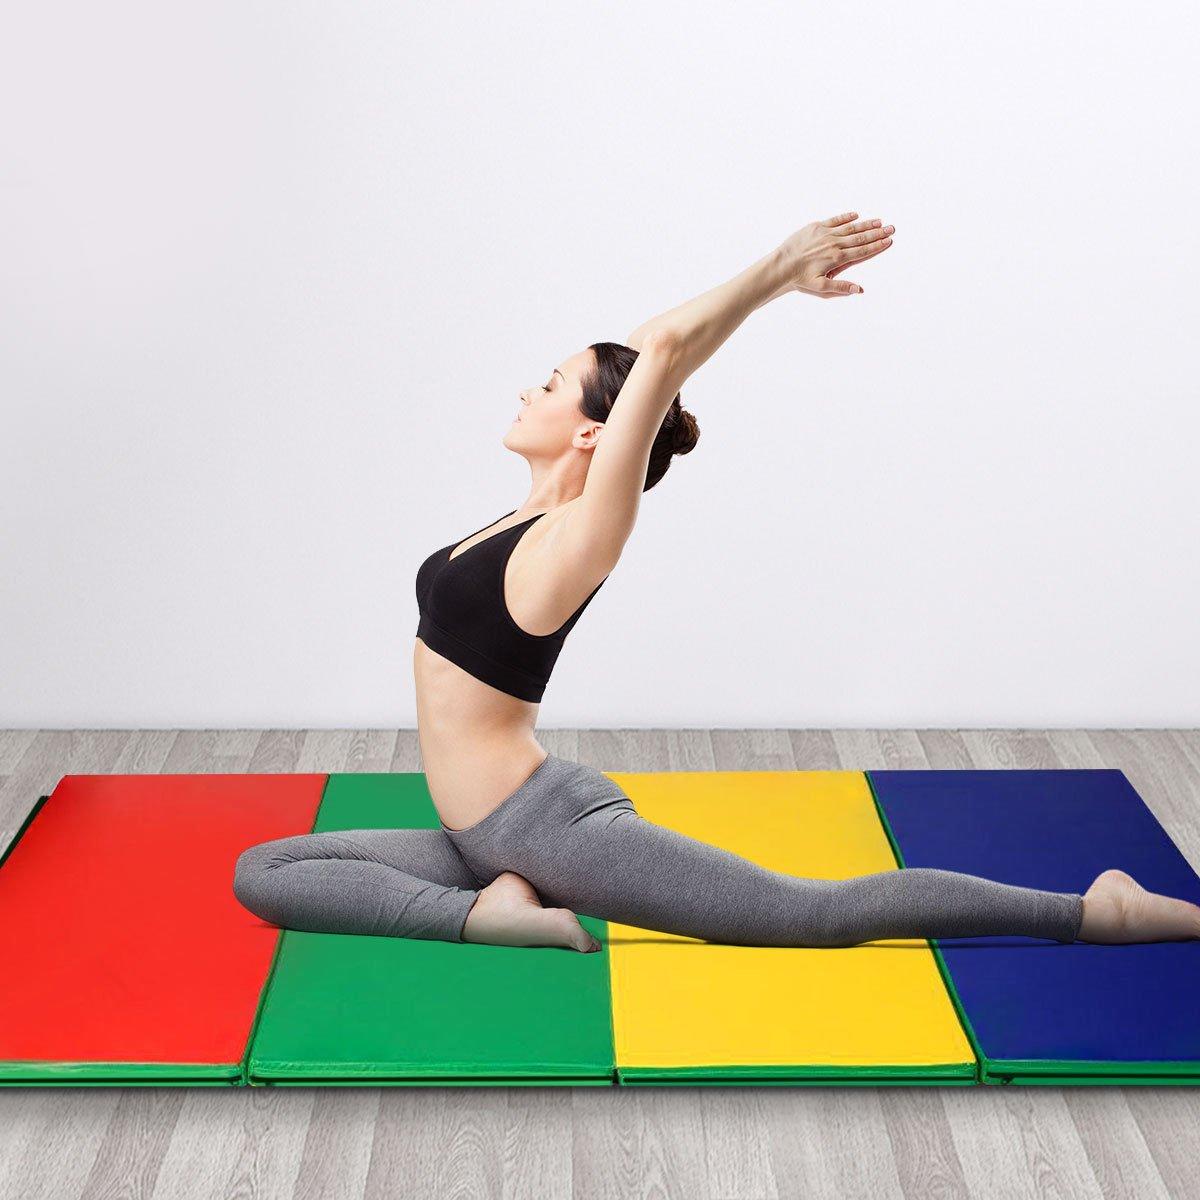 180X120X5cm Gymnastic Folding Gymnastics Panel Gym Exercise Yoga Pad Tumbling Fitness Mat Outdoor Camping Damp Proof Yoga Mat